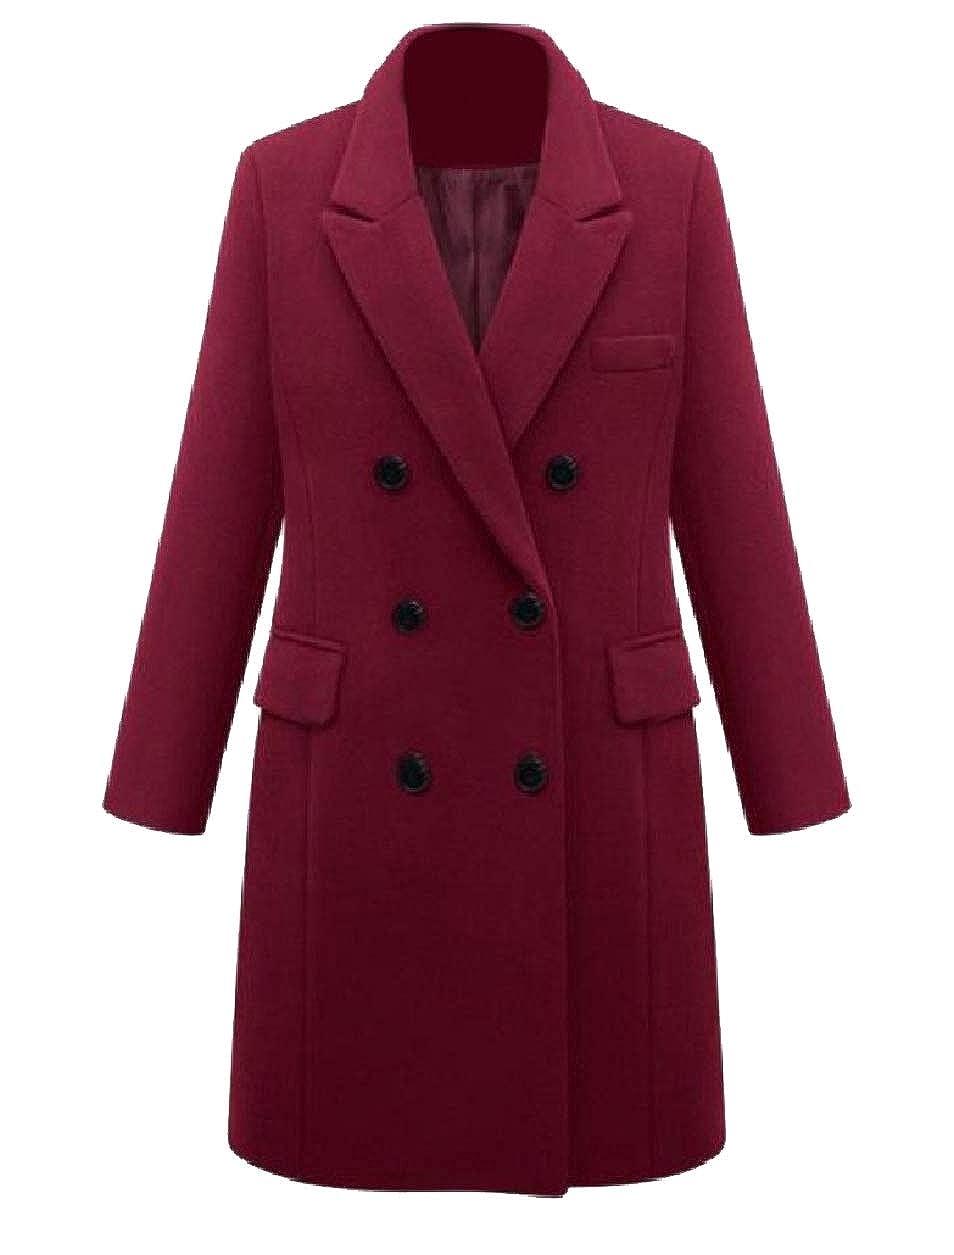 Abetteric Women's Fall Winter Double Button Plus Size Jackets Long Pea Coat